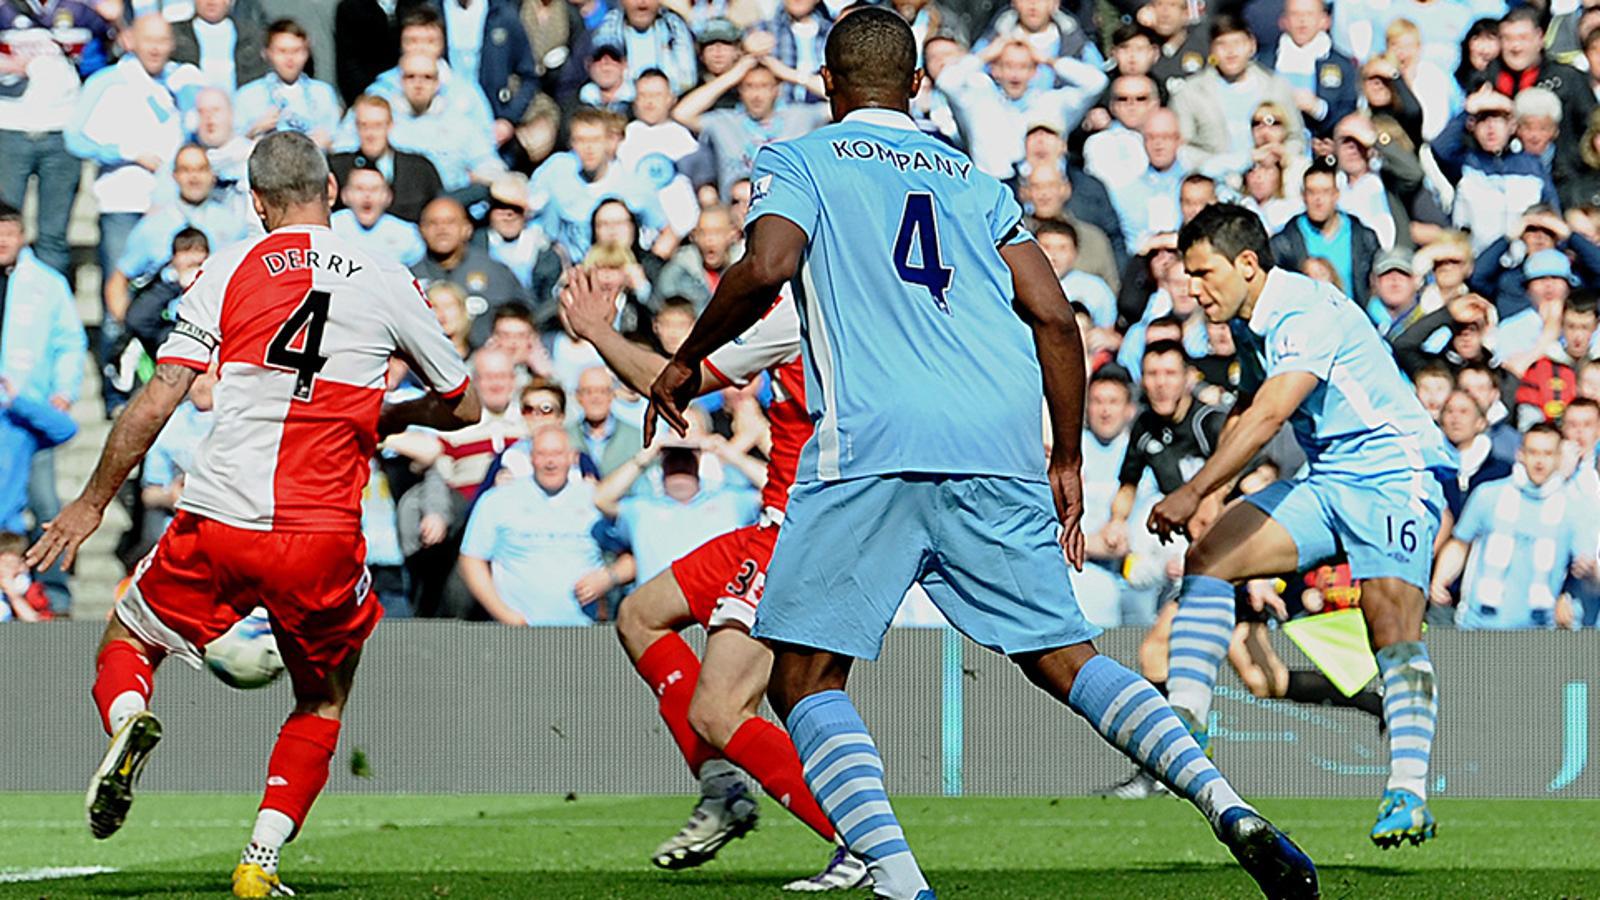 2011/12 Premier League Years